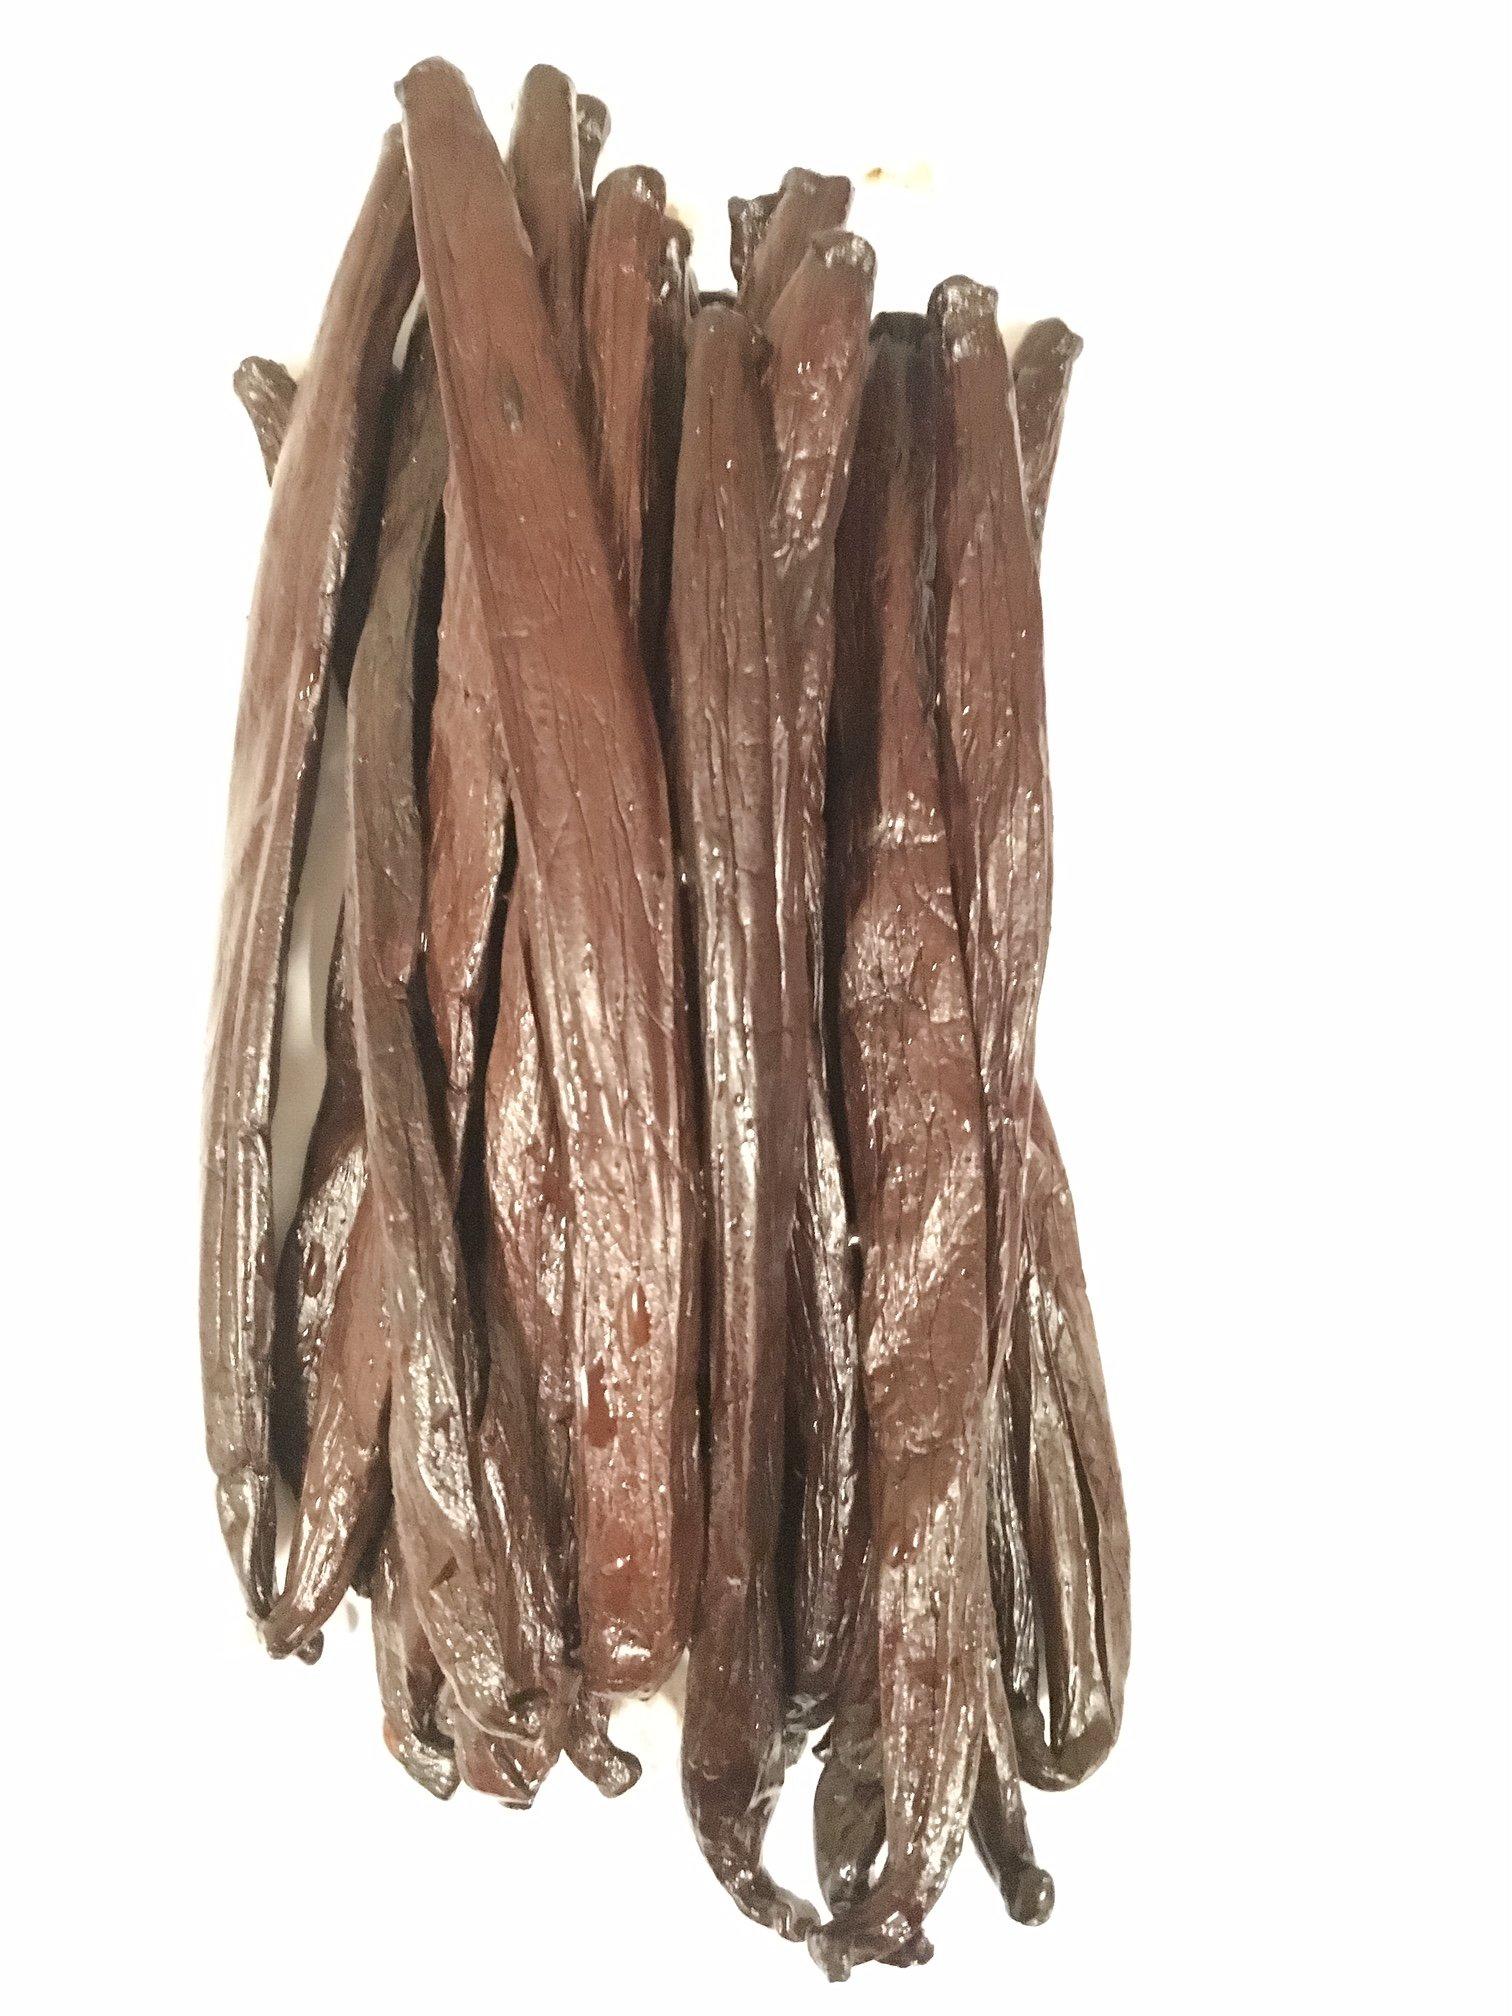 Tahitian Vanilla Beans by Slofoodgroup, Grade A Tahitian Vanilla Beans (Vanilla Tahitensis), Gourmet Tahitian Vanilla Beans Grown in Tahiti (.5 lb, 8 oz)